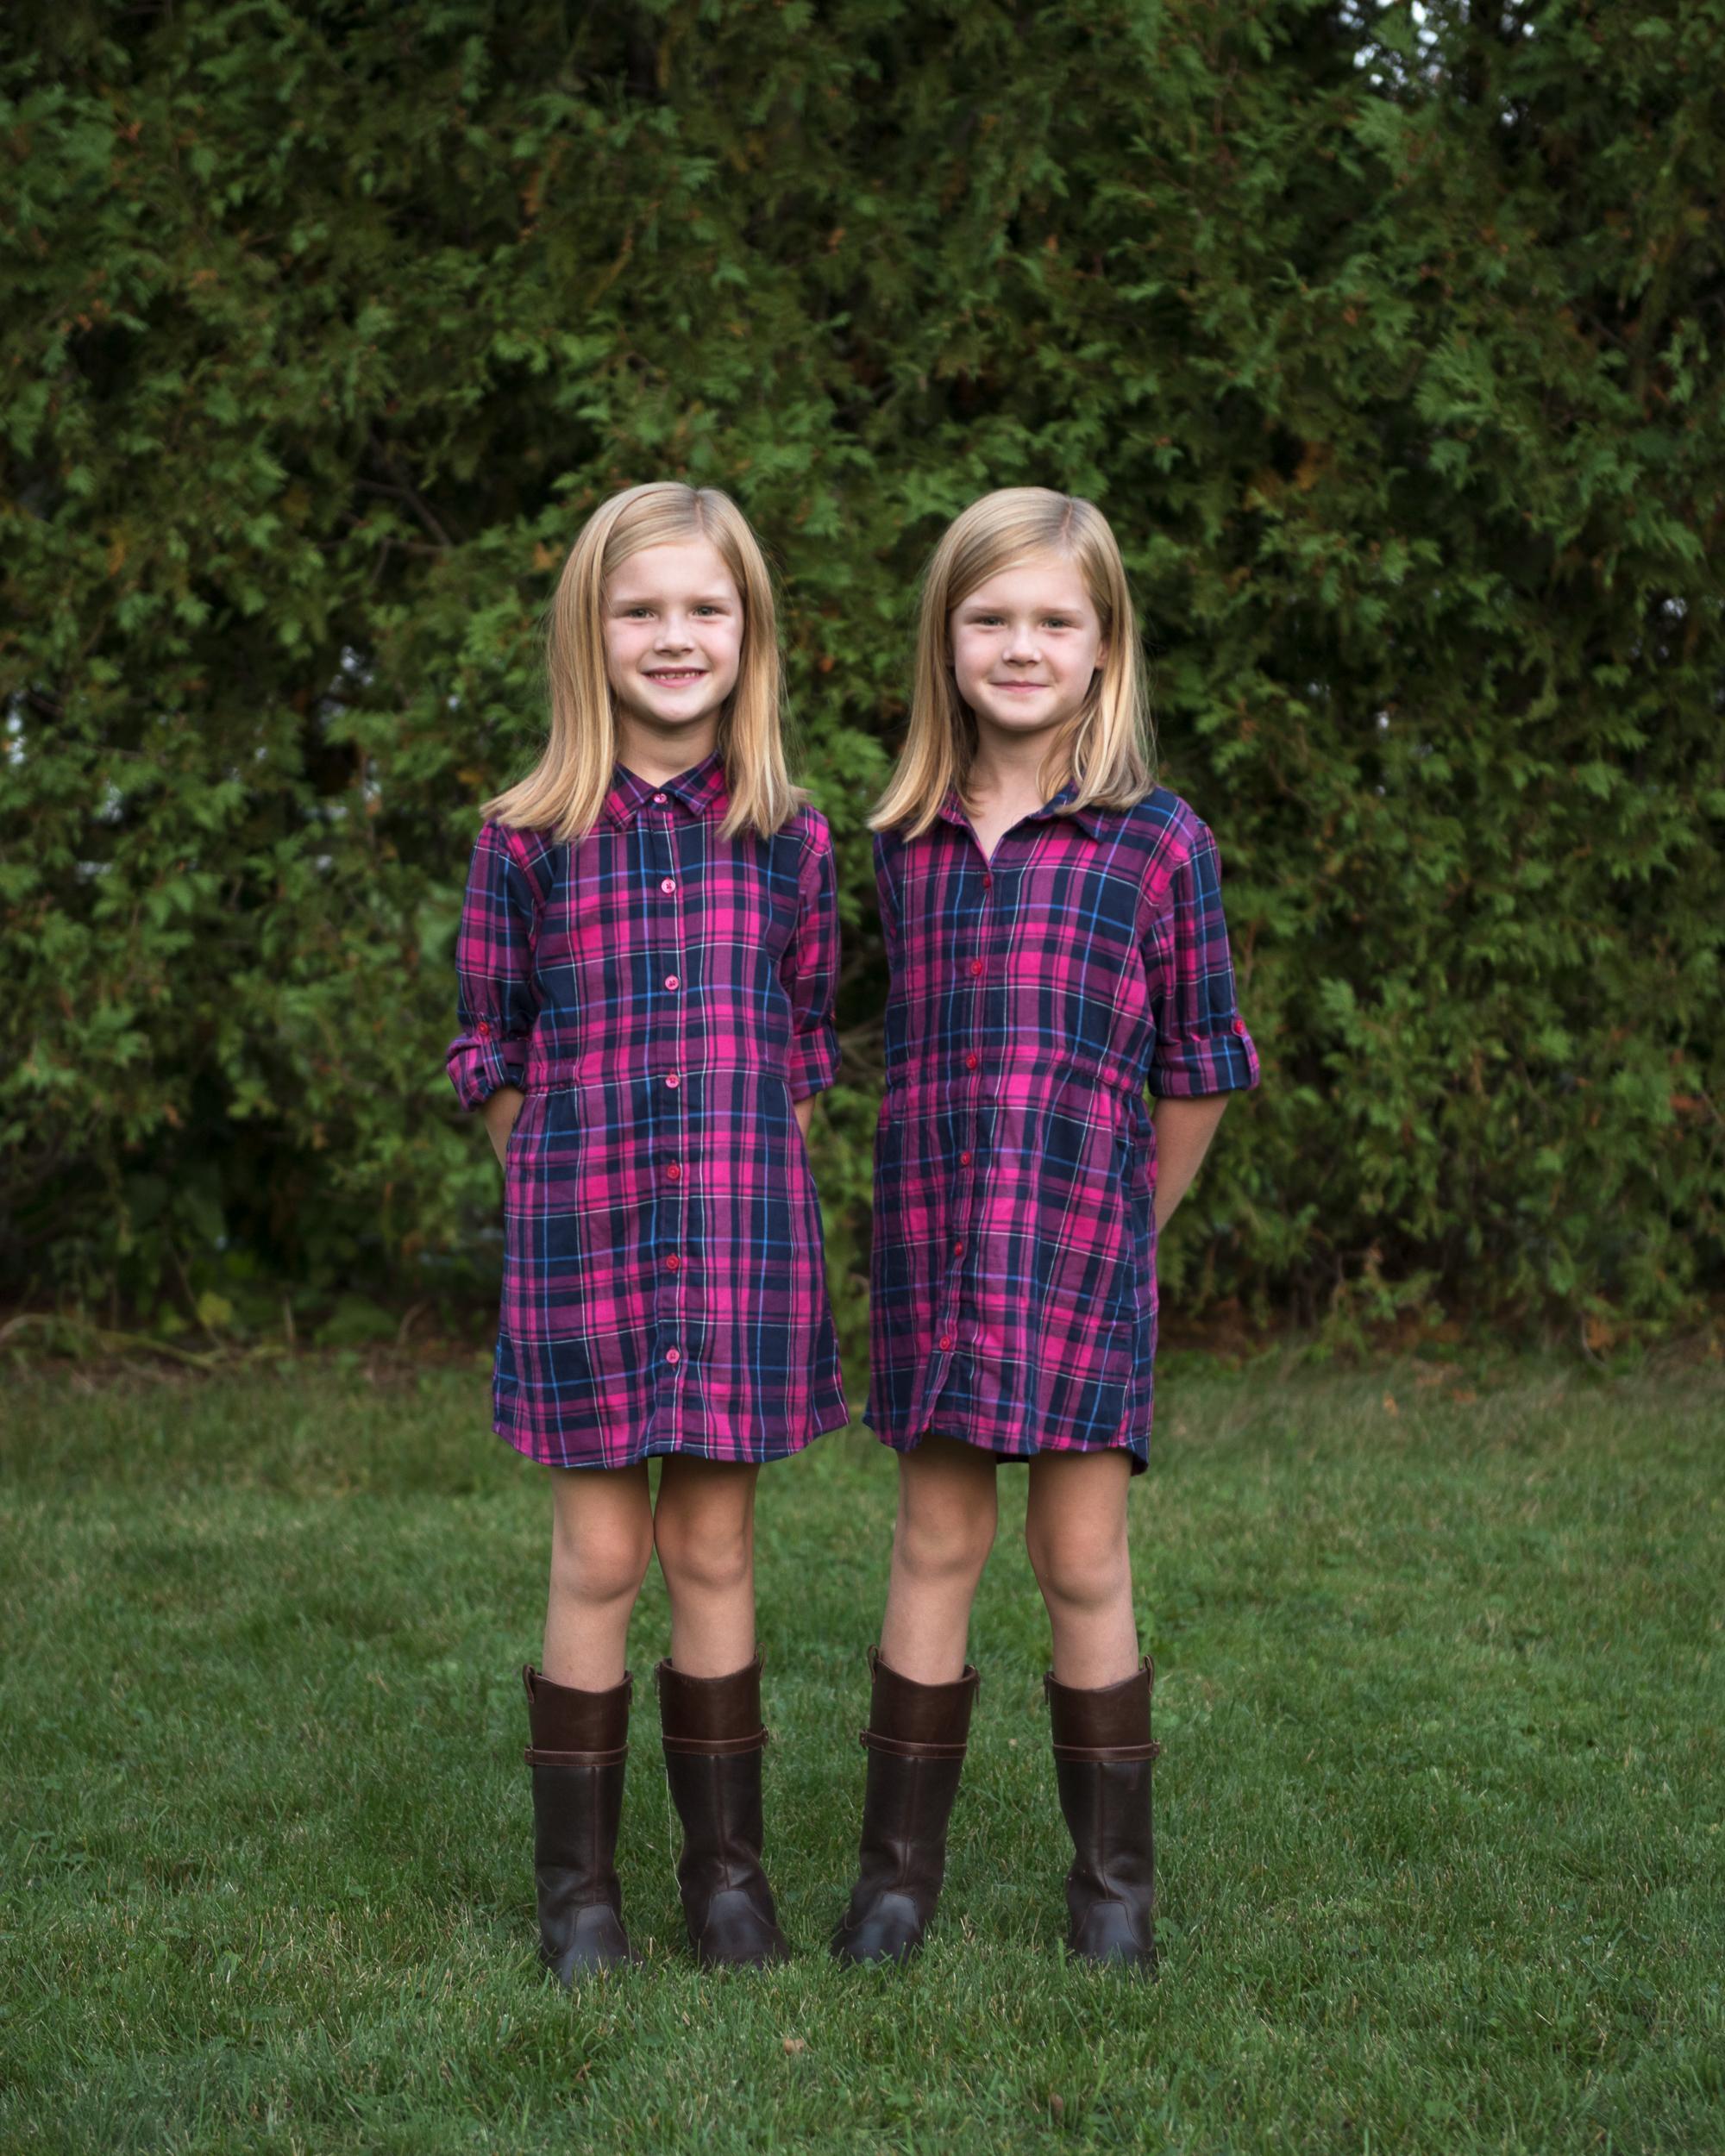 Campbell_twins_002.jpg